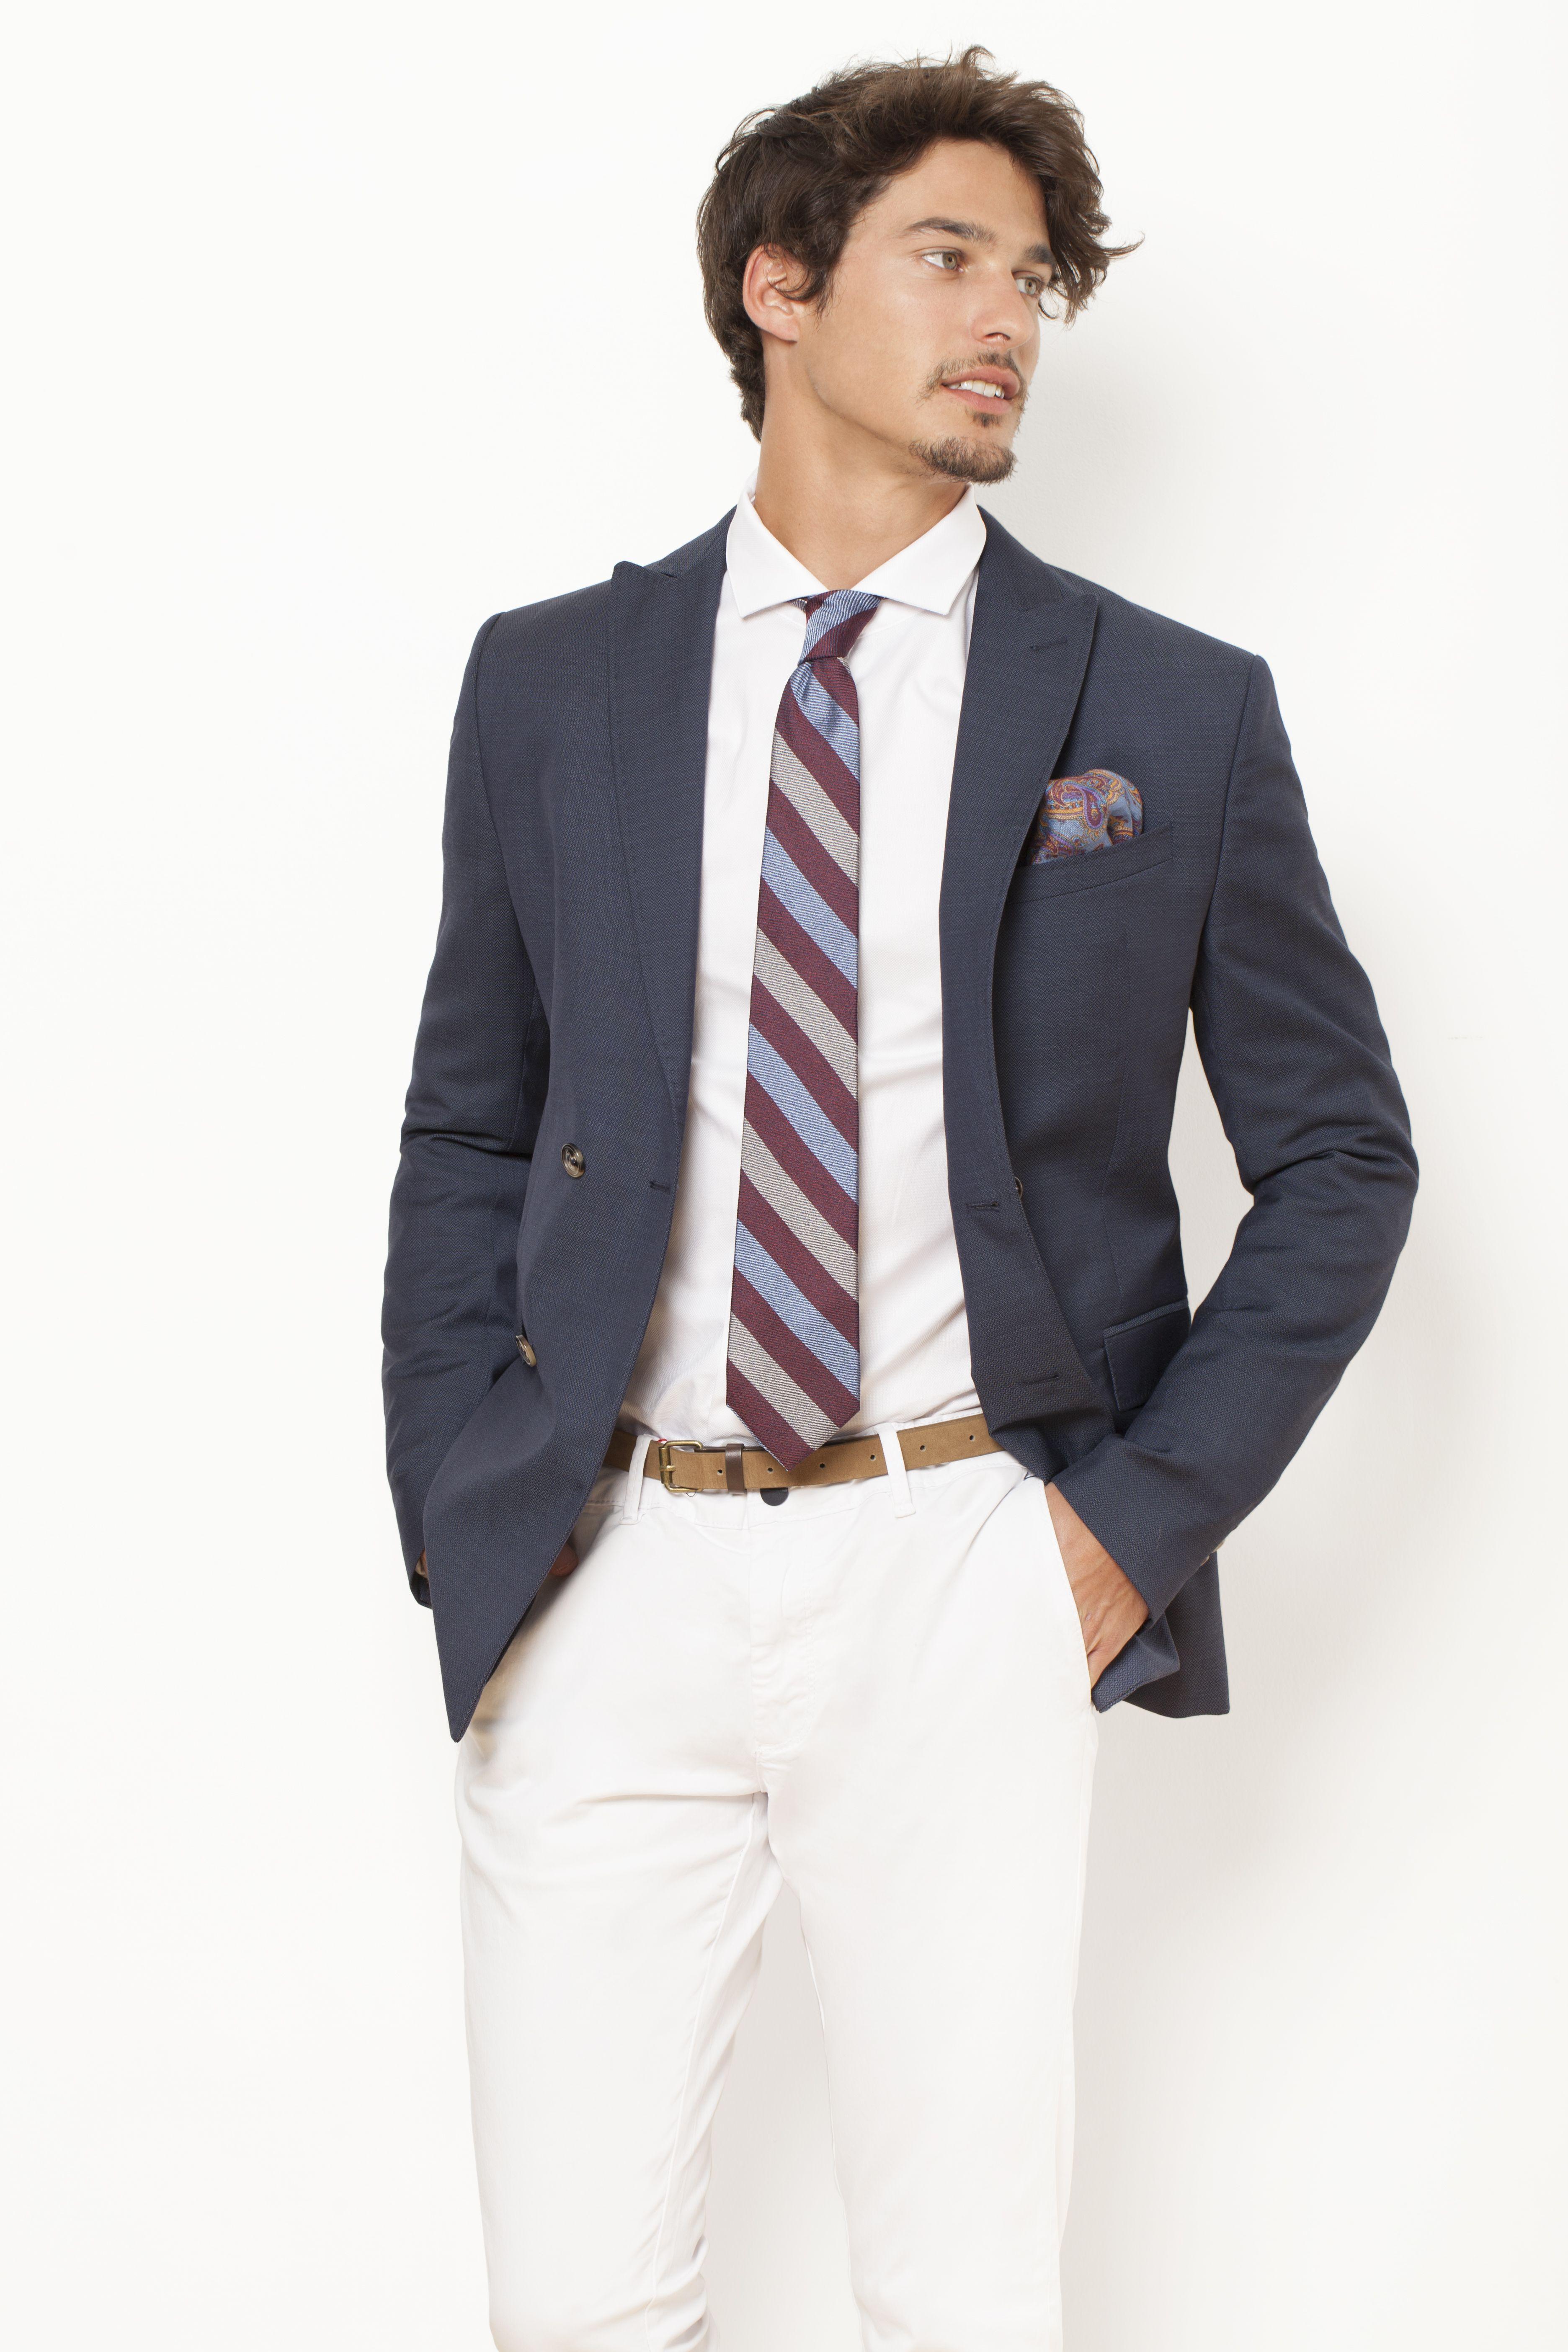 Seda Pitti Stripes Azules Corbata De Granates Rayas Y Yyf6b7gv